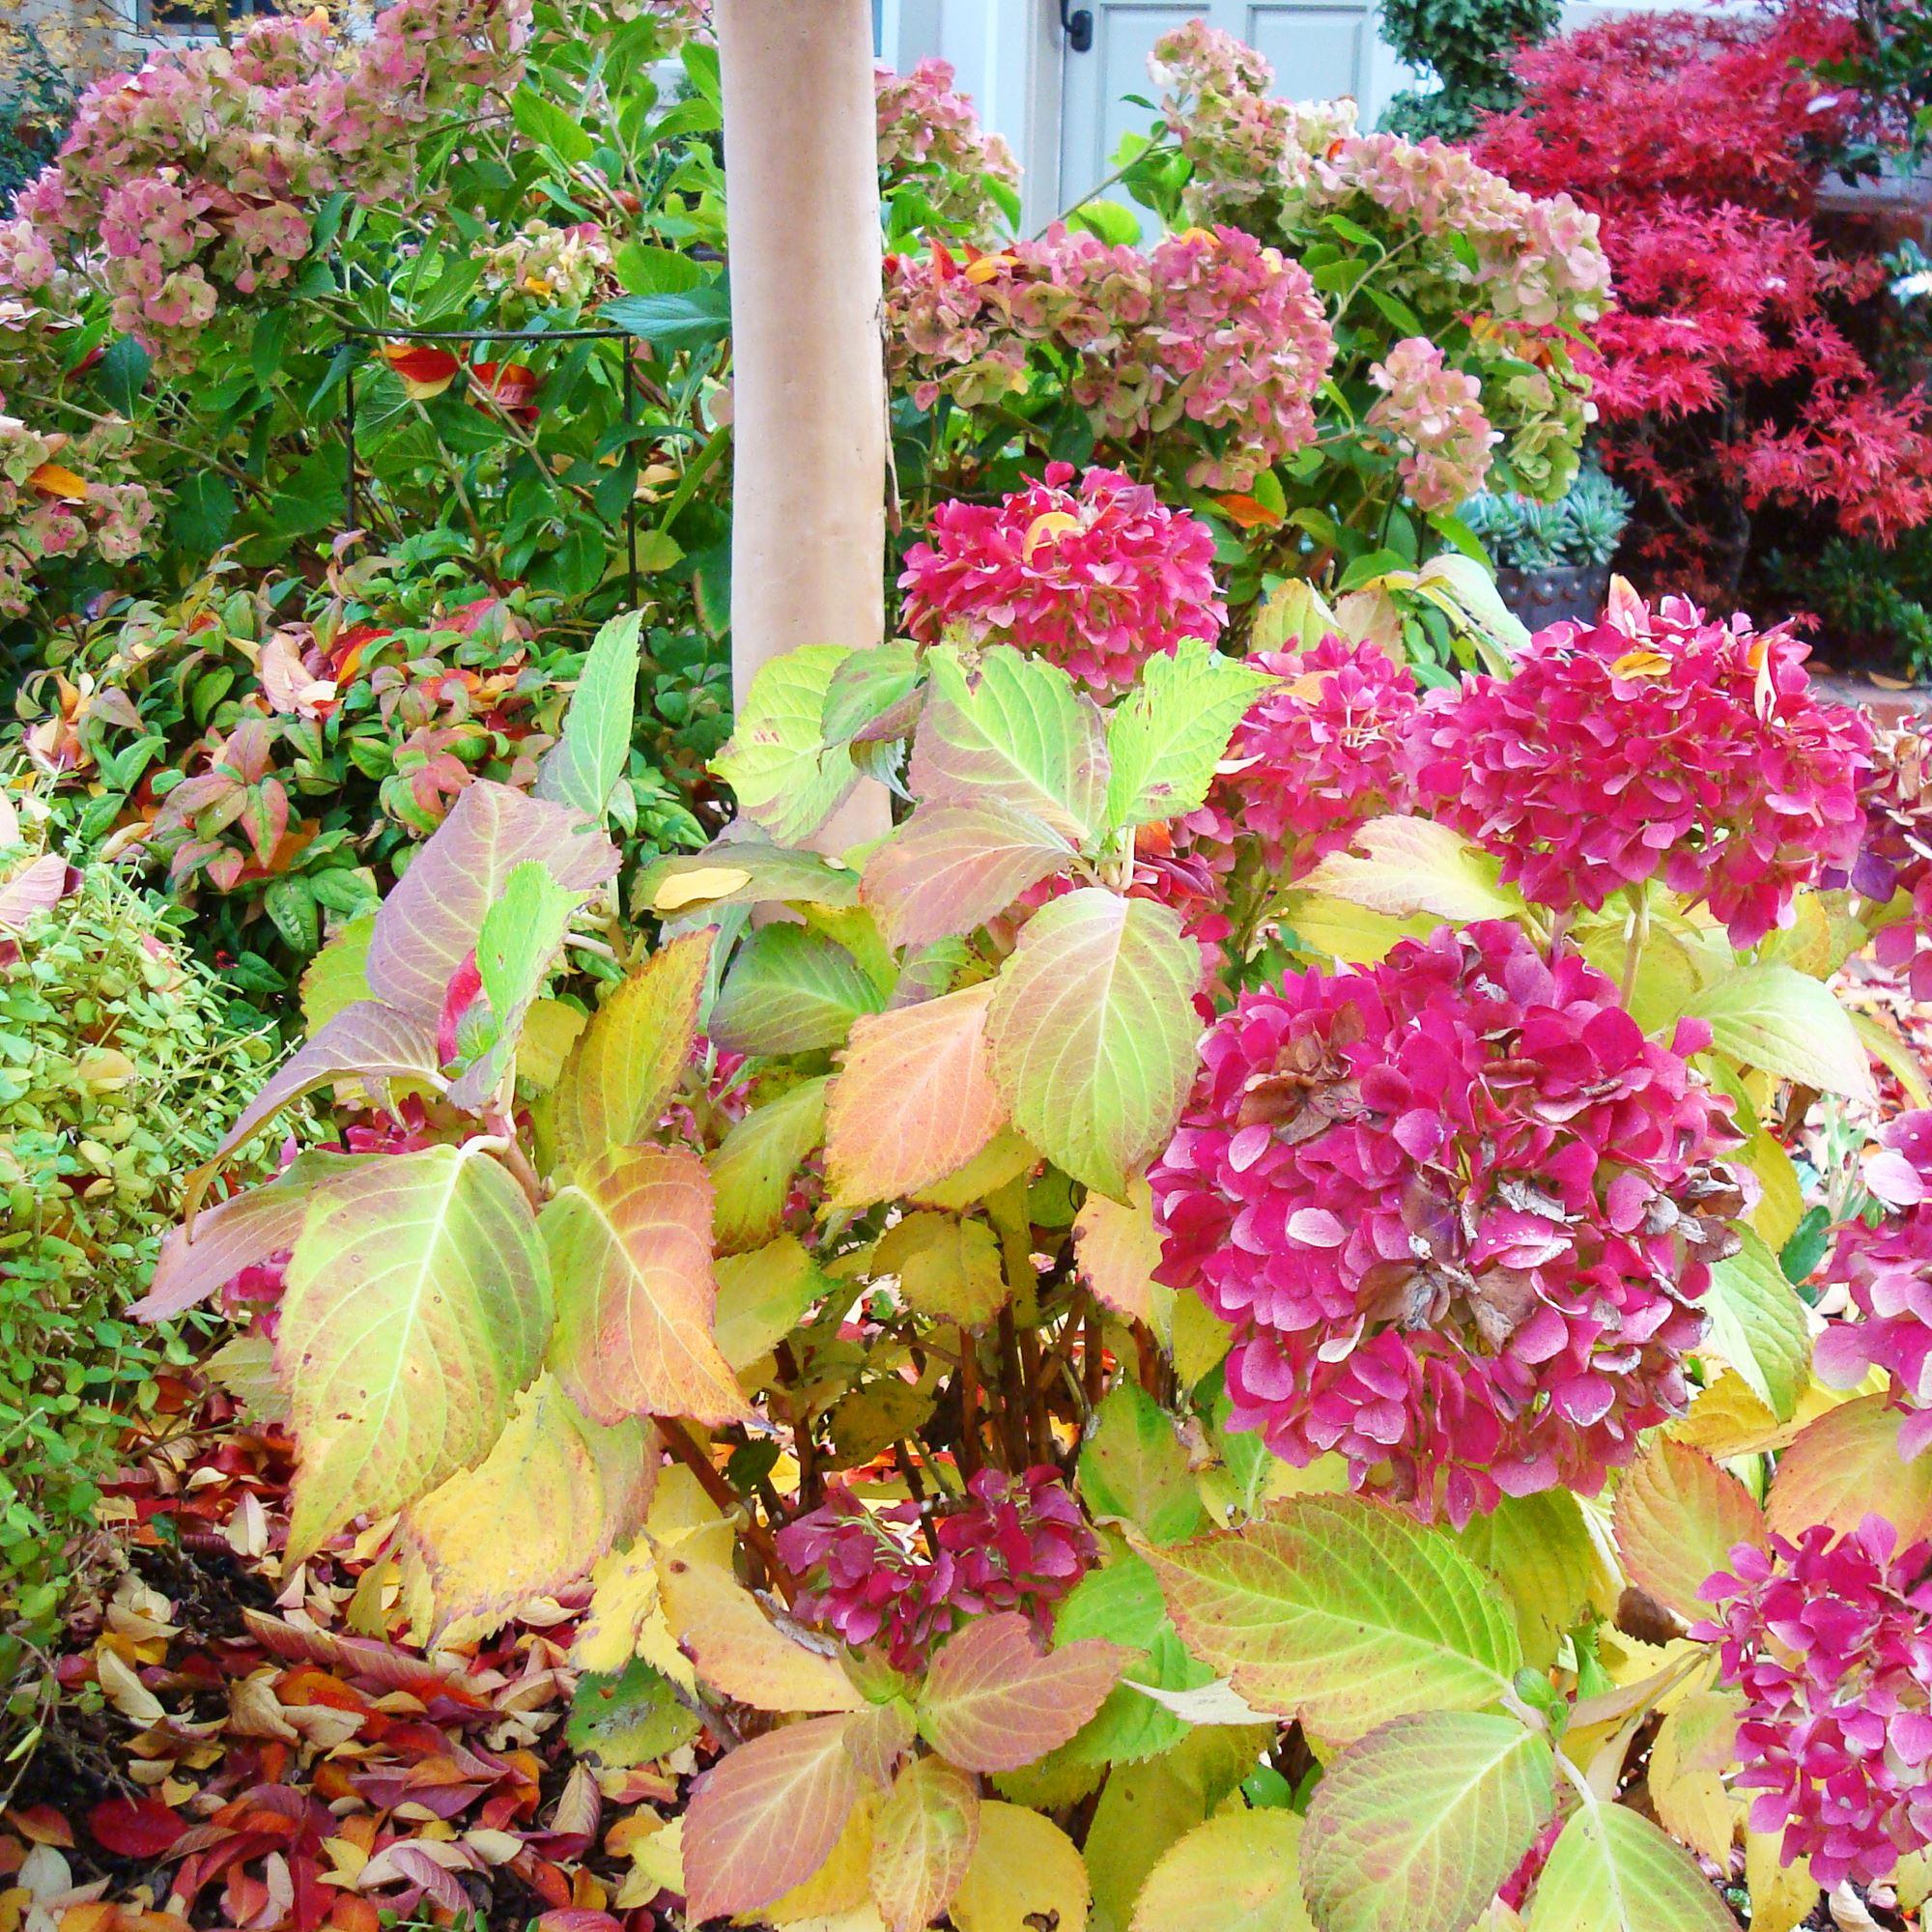 Pruning Hydrangeas In Mild Climate Zones